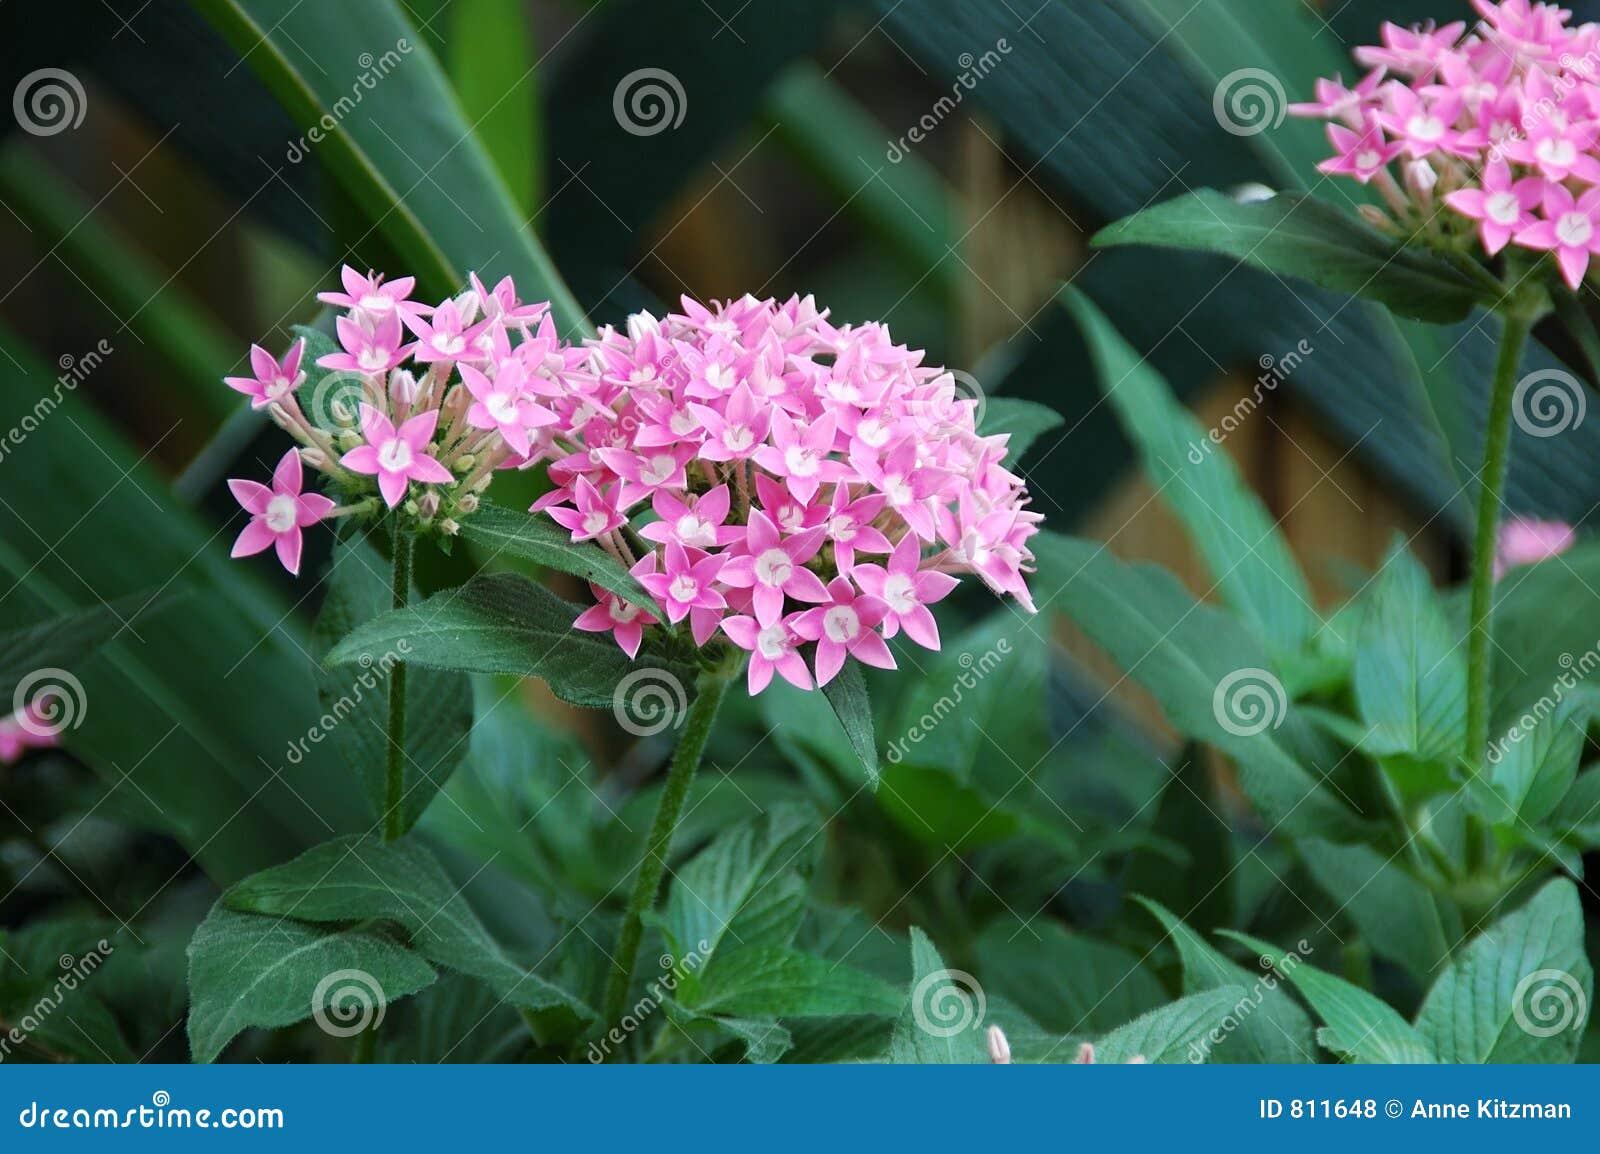 Pink allium flowers stock photo image of flowers allium 811648 pink allium flowers mightylinksfo